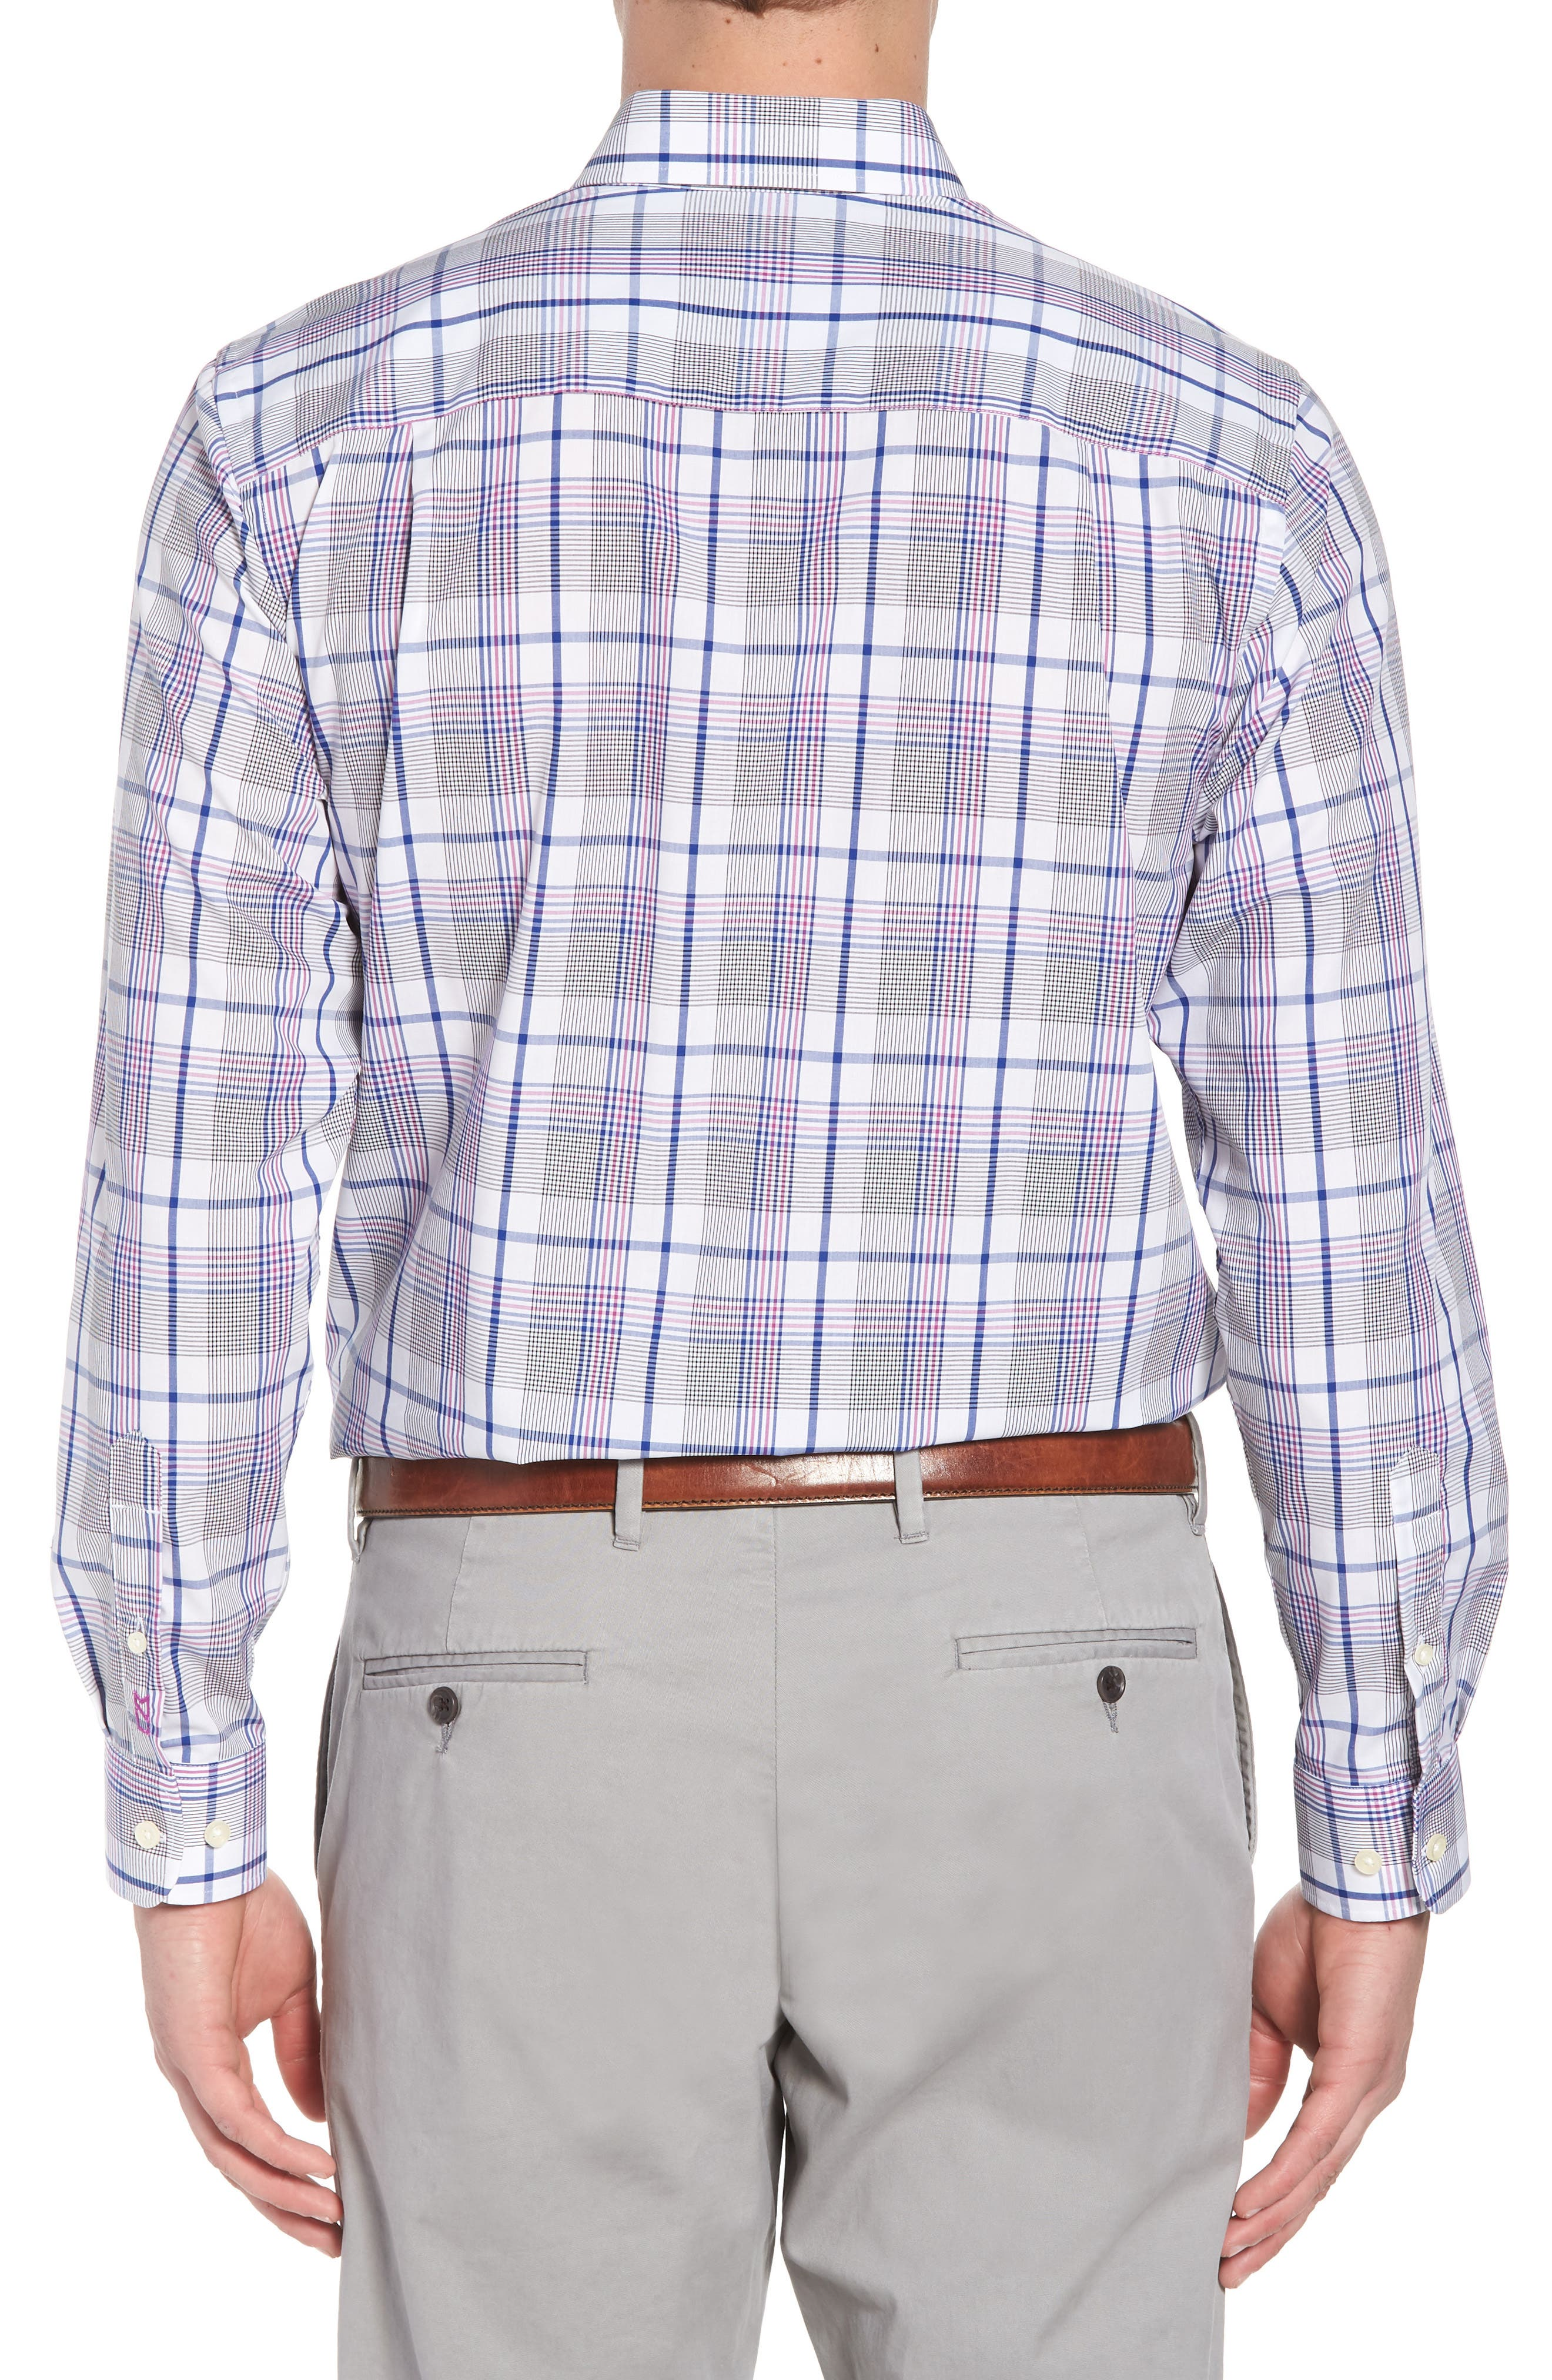 Aidan Non-Iron Plaid Sport Shirt,                             Alternate thumbnail 2, color,                             419